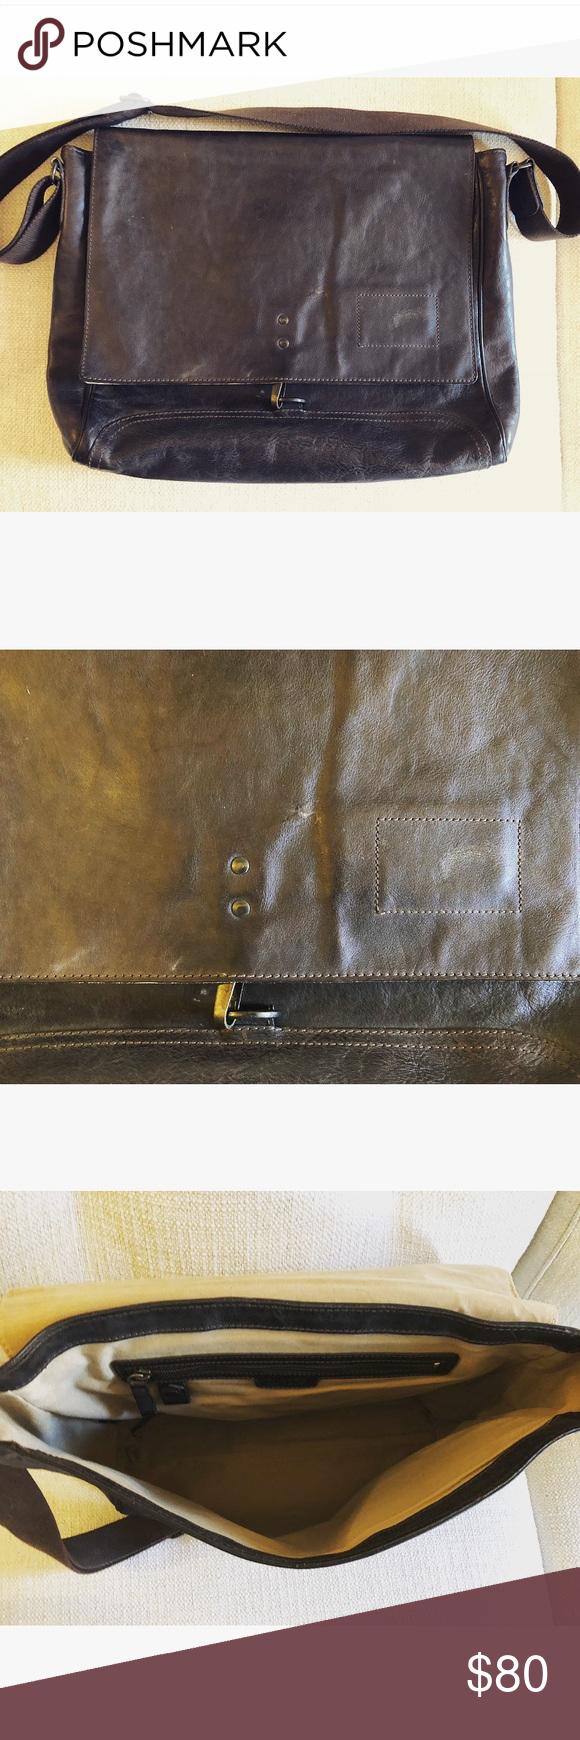 Men s Banana Republic Leather Messenger Bag Men s Banana Republic Leather  Messenger Bag Banana Republic Bags Messenger Bags 8f2f6e9e69